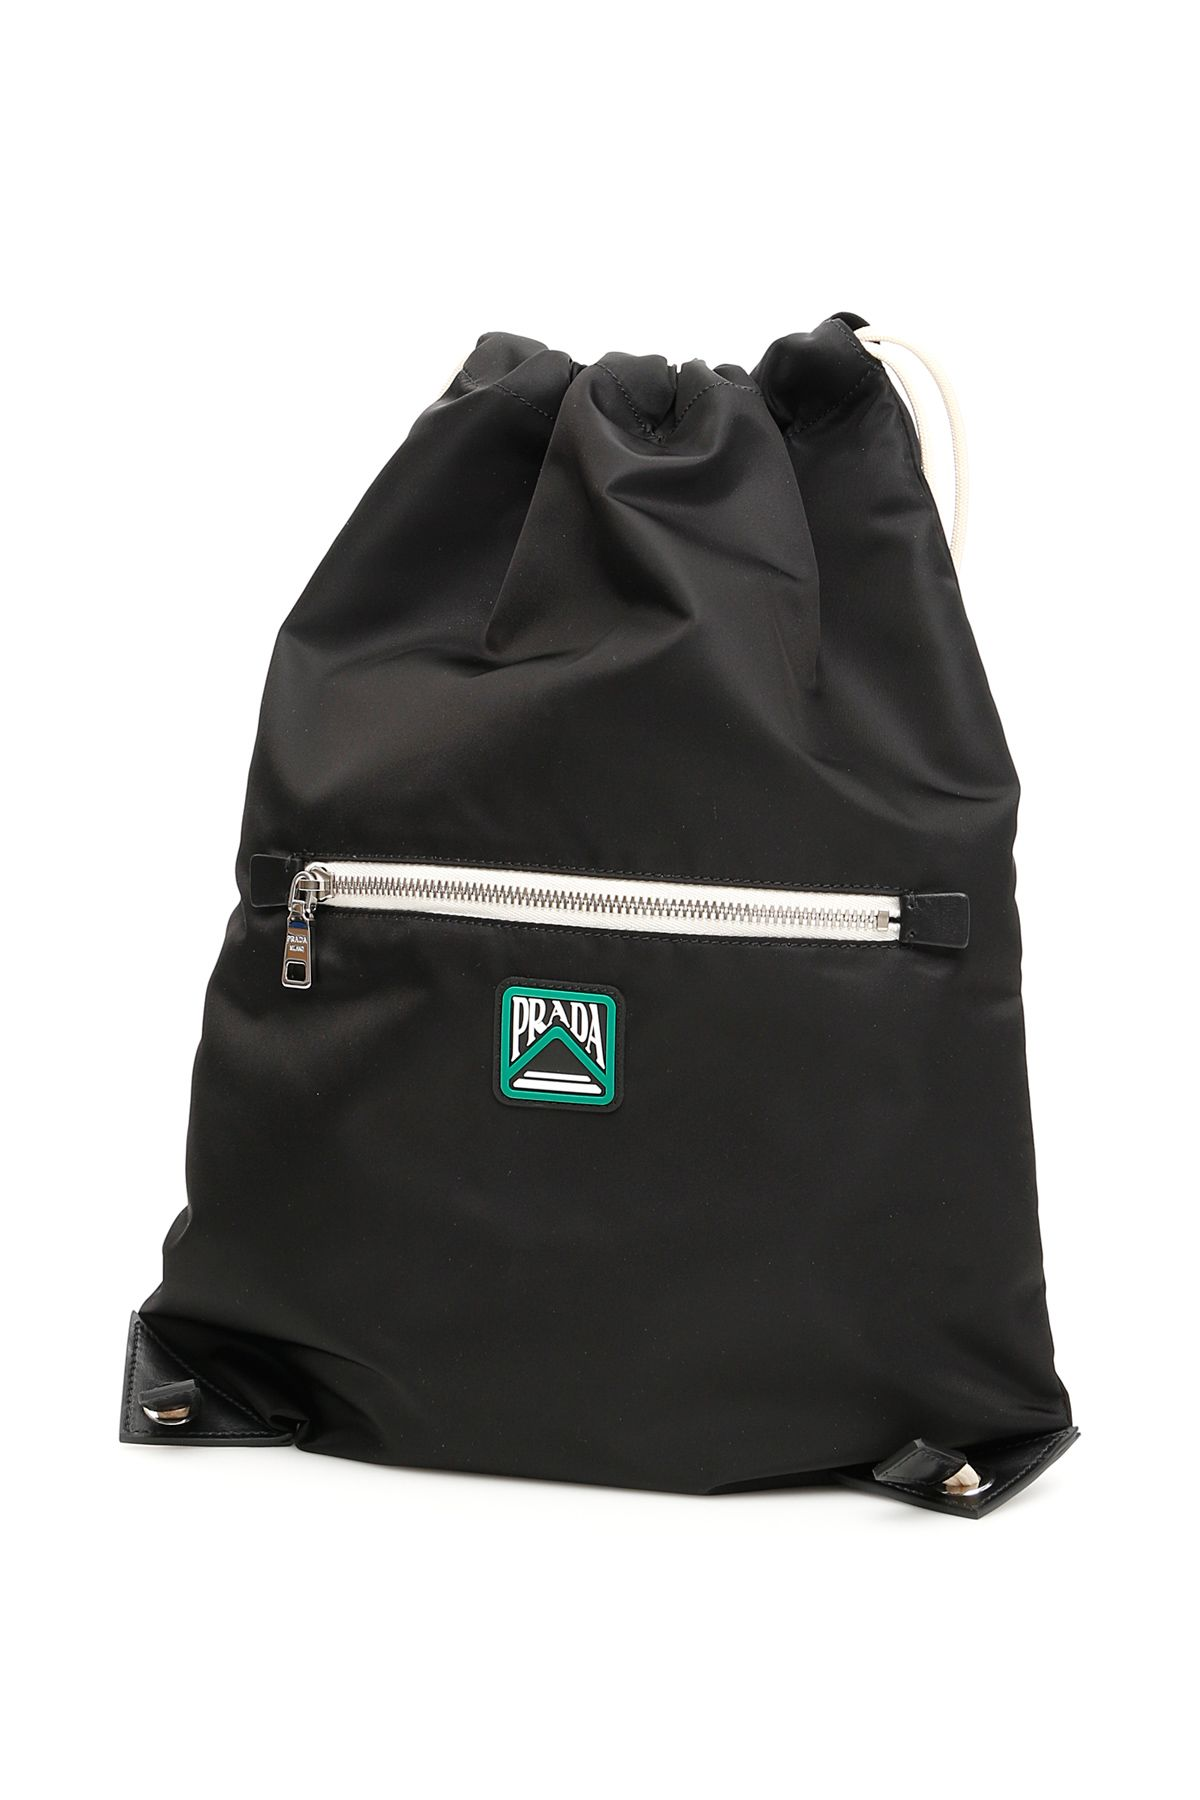 b04582644dfc74 Prada Prada Backpack With Logo Patch - Basic - 10801372 | italist